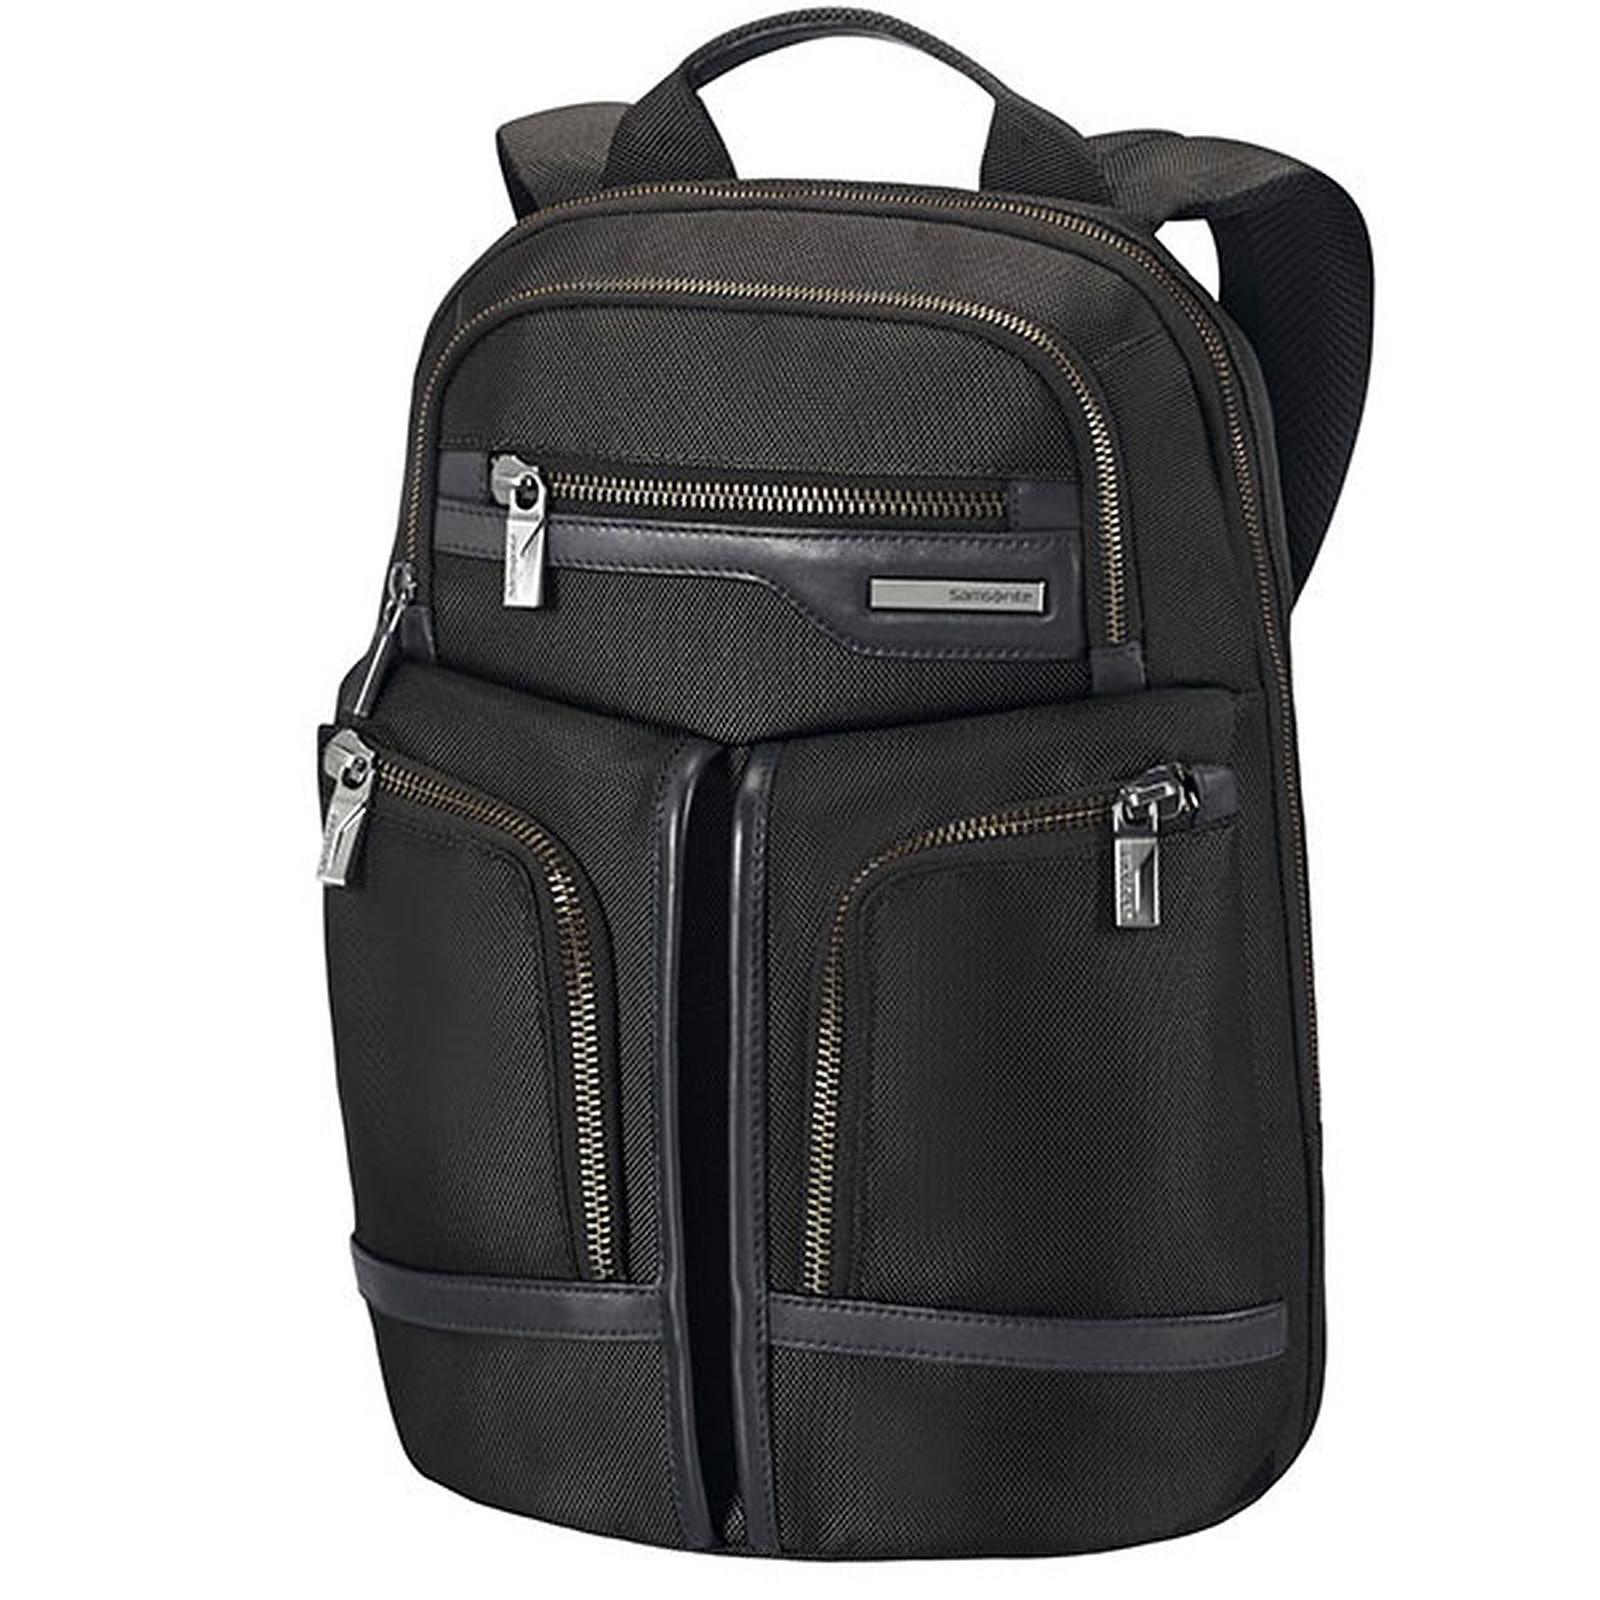 e6e3608cd7 Samsonite GT Supreme Backpack 14.1